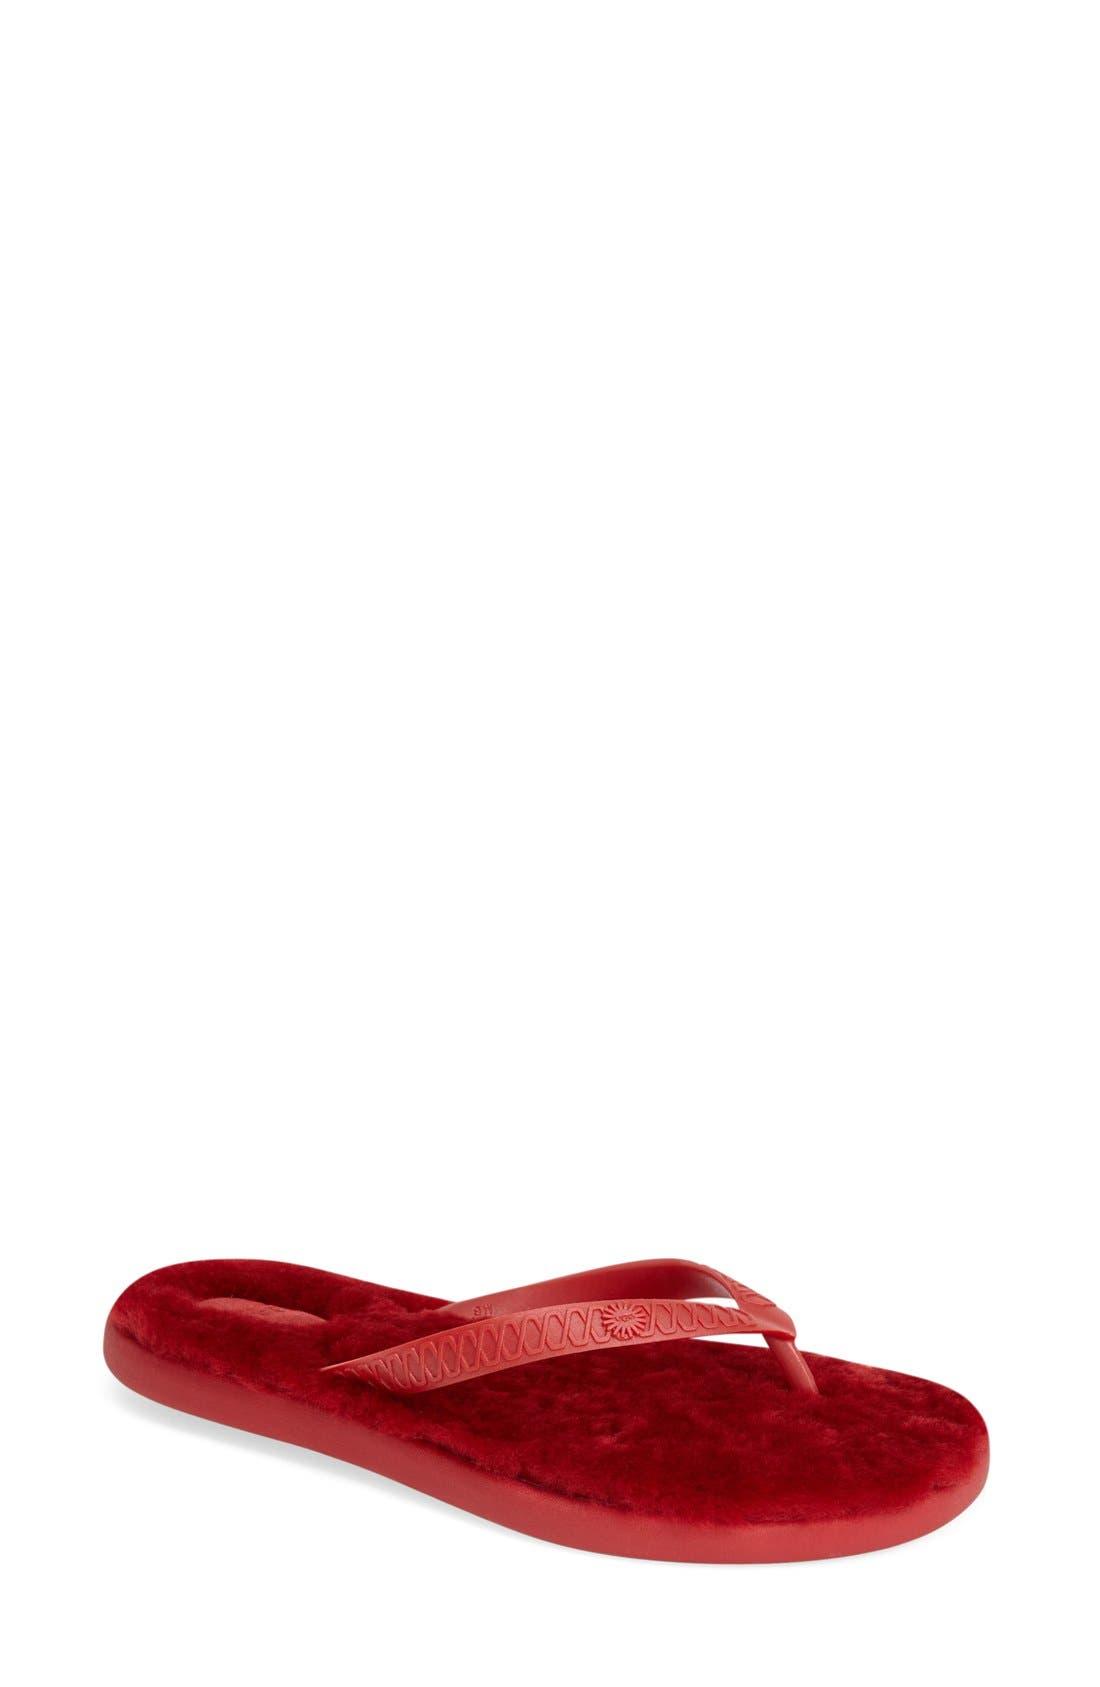 Main Image - UGG® 'Fluffie' Flip Flop (Women)